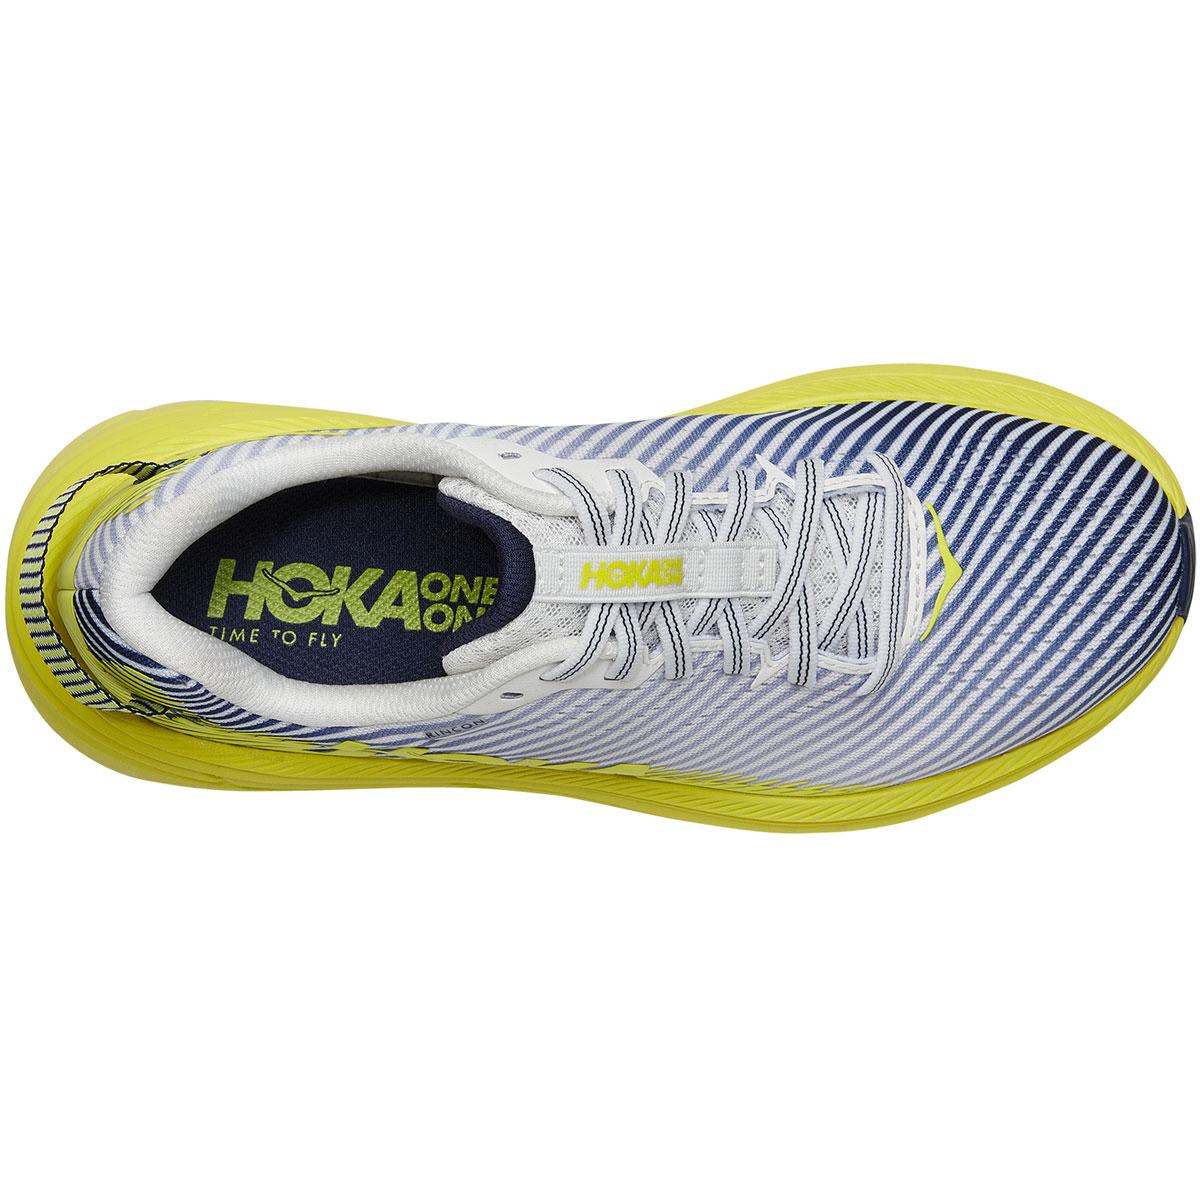 Women's Hoka One One Rincon 2 Running Shoe - Color: Blanc De Blanc - Size: 5.5 - Width: Regular, Blanc De Blanc, large, image 5